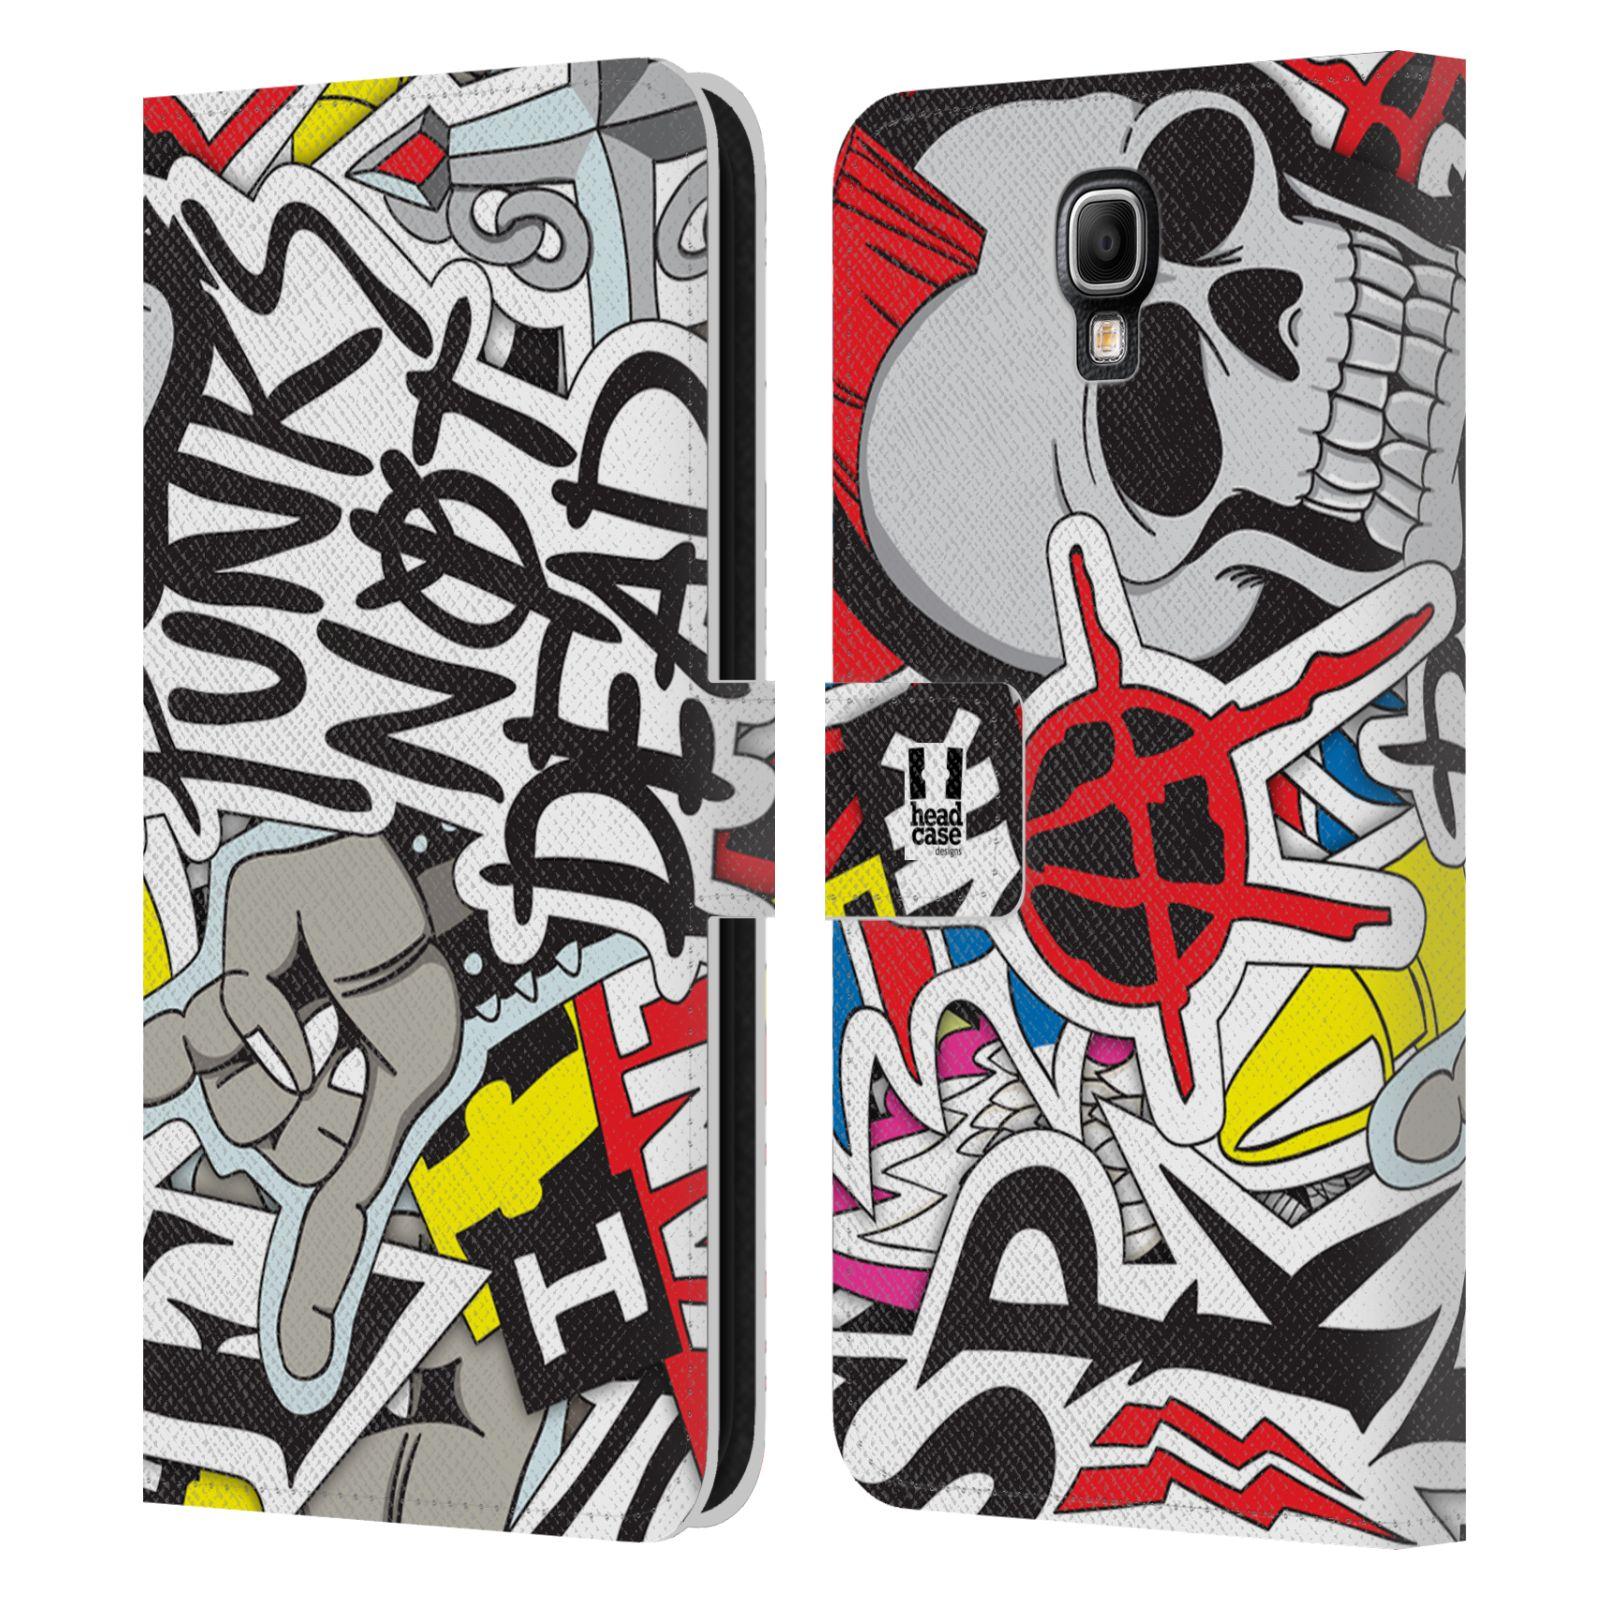 HEAD CASE Flipové pouzdro pro mobil Samsung Galaxy Note 3 NEO (N7505) vzor STICKER nálepky PUNK IS NOT DEAD